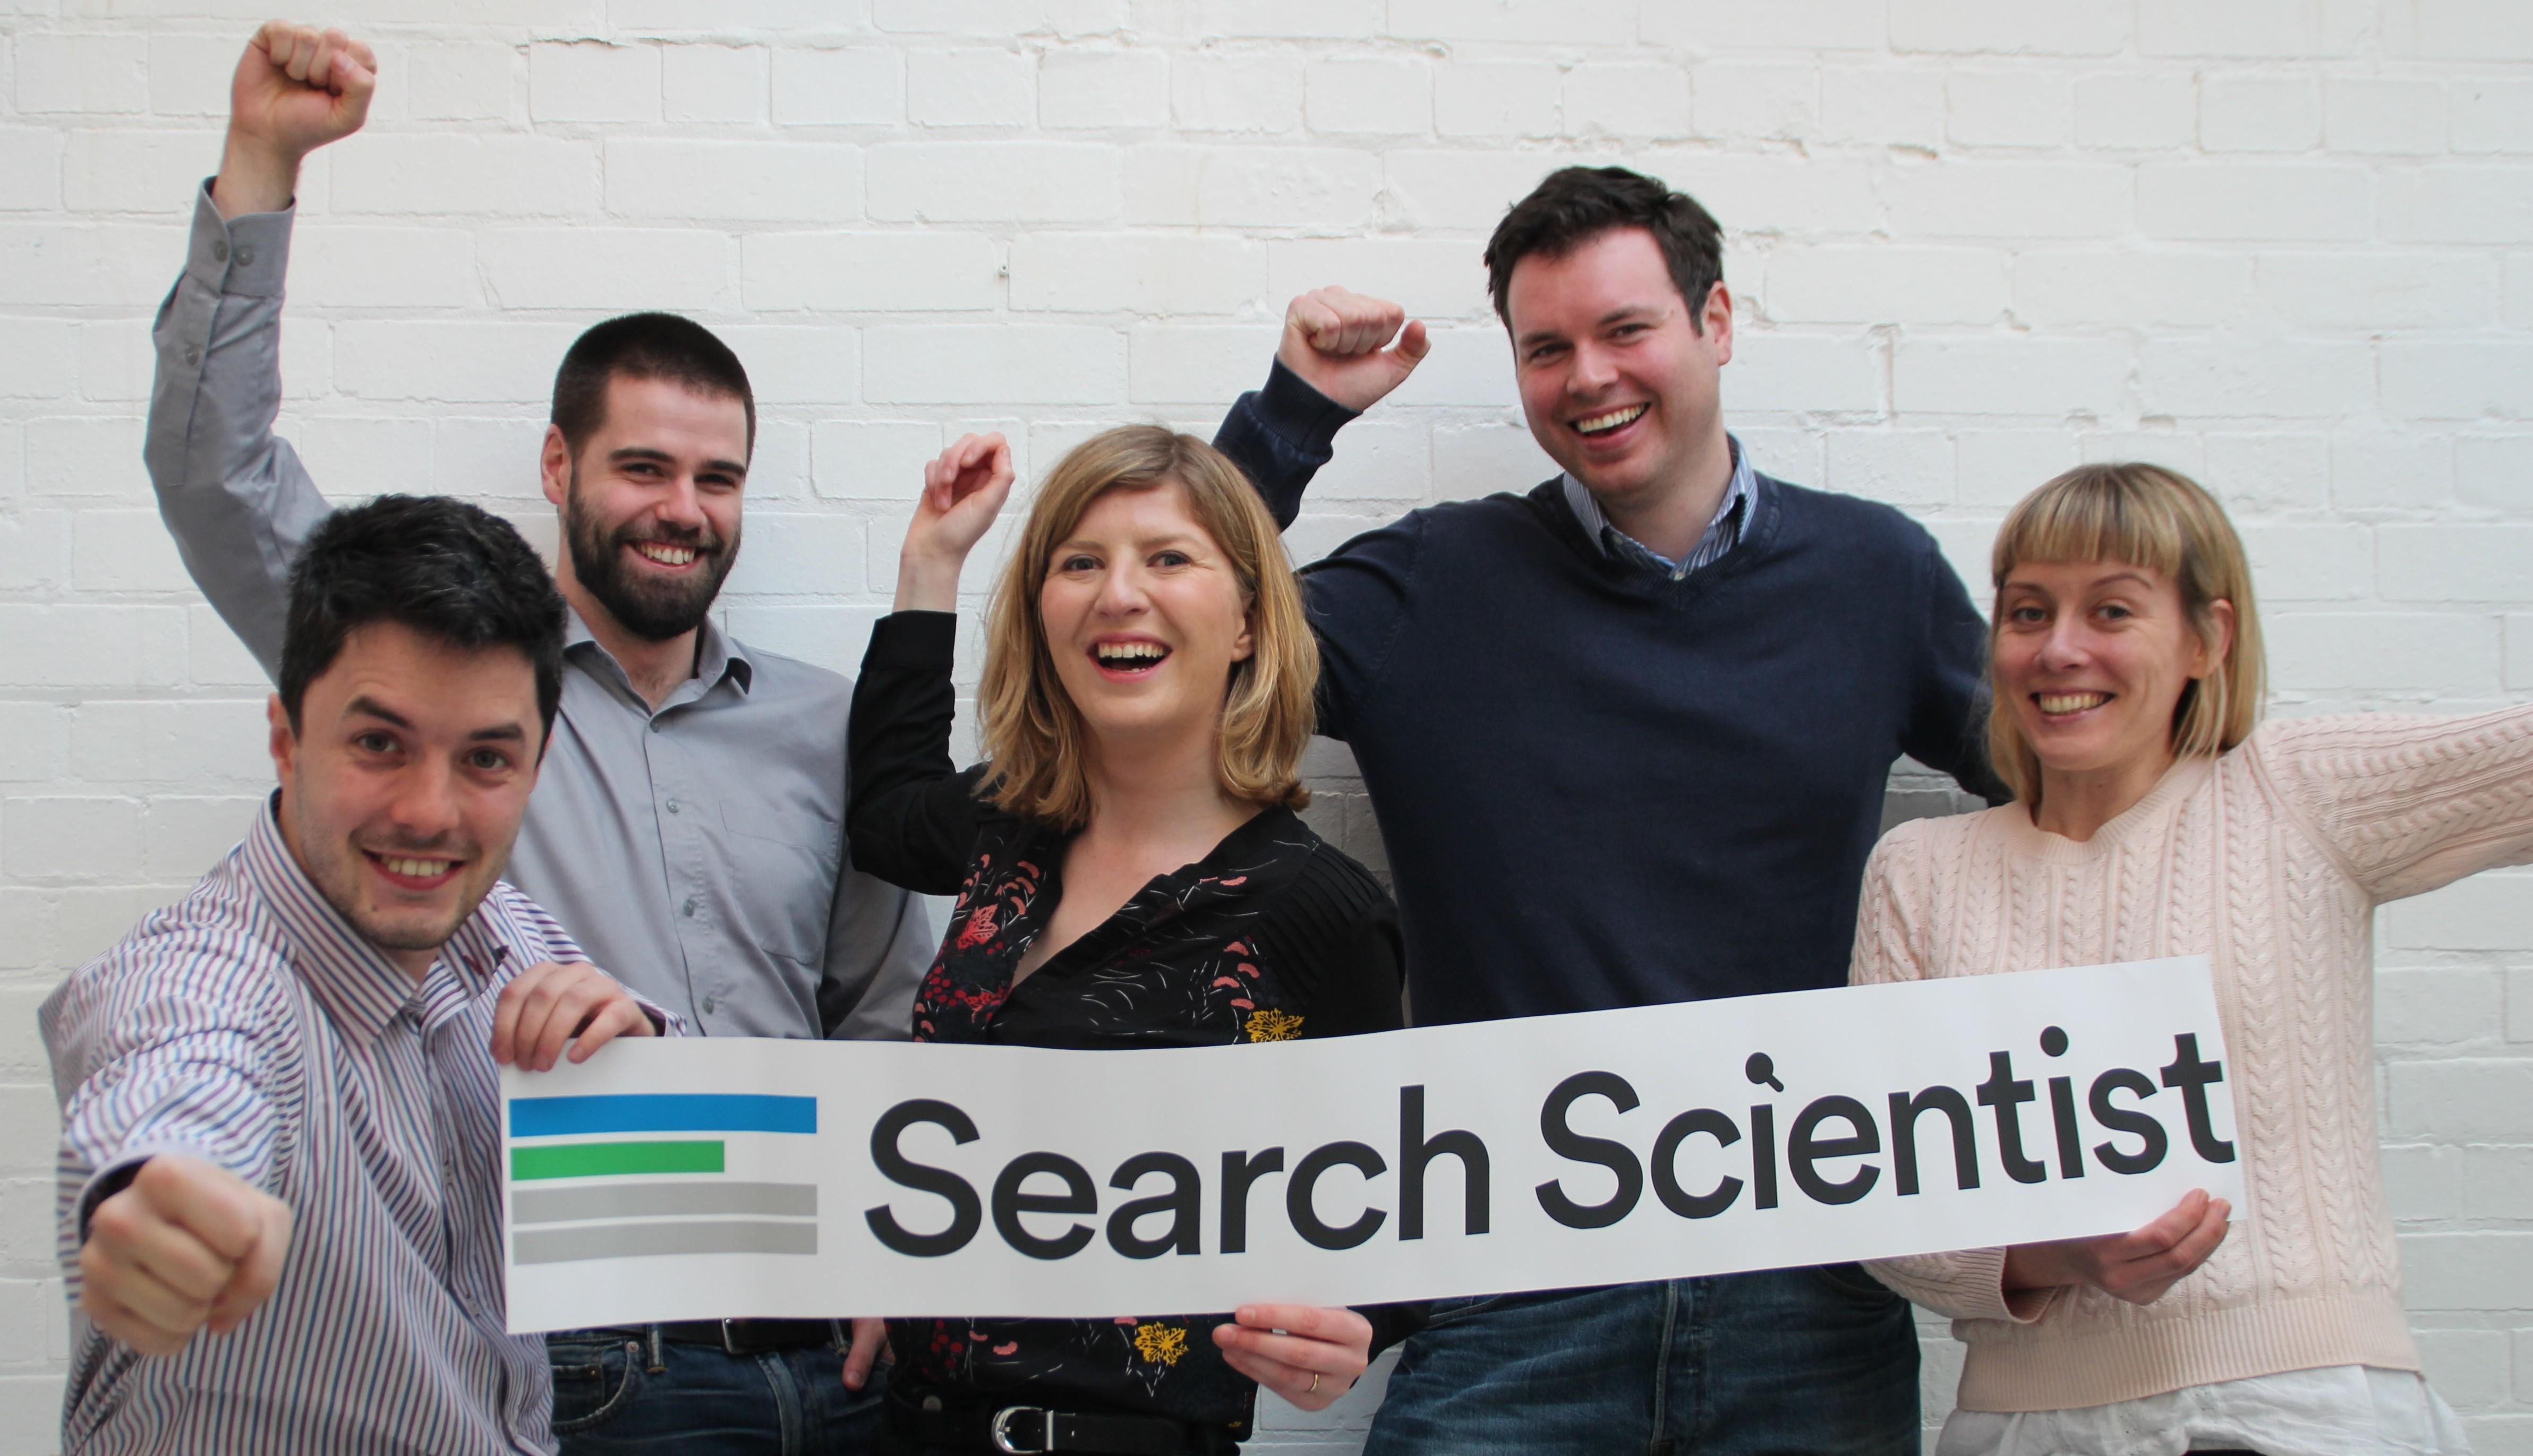 go team Search Scientist